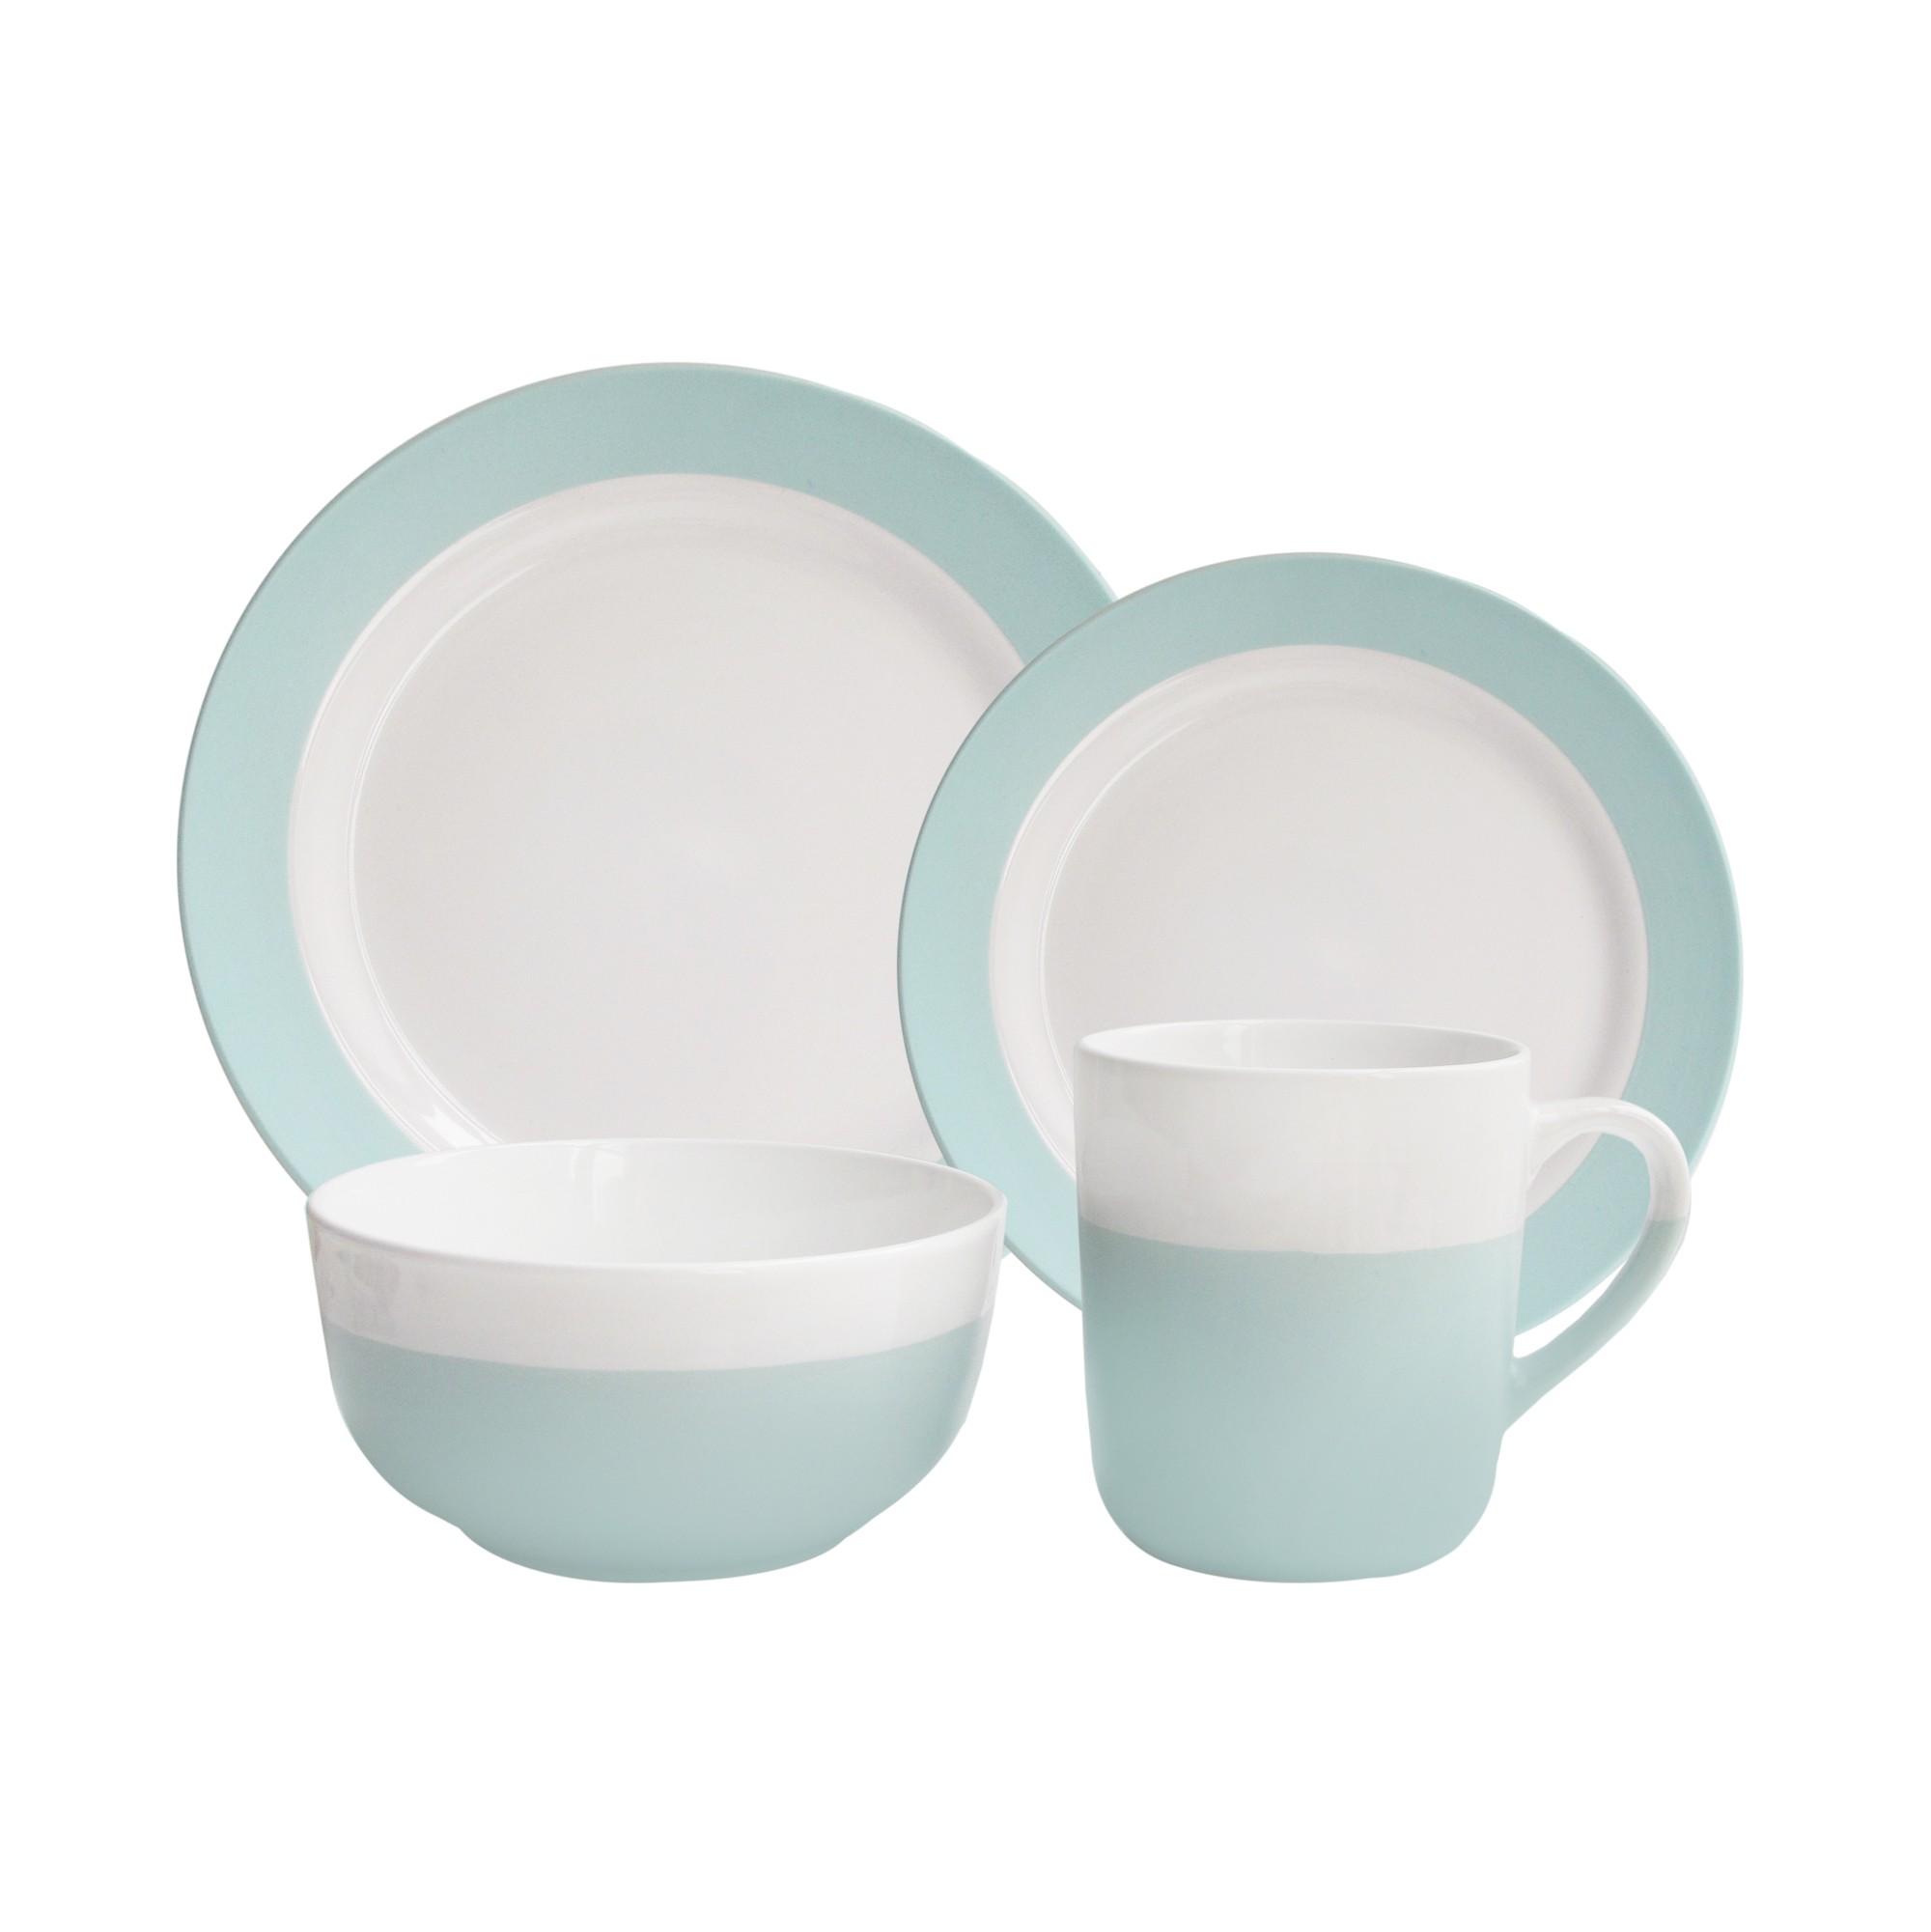 American Atelier Serene 16 Piece Dinnerware Set